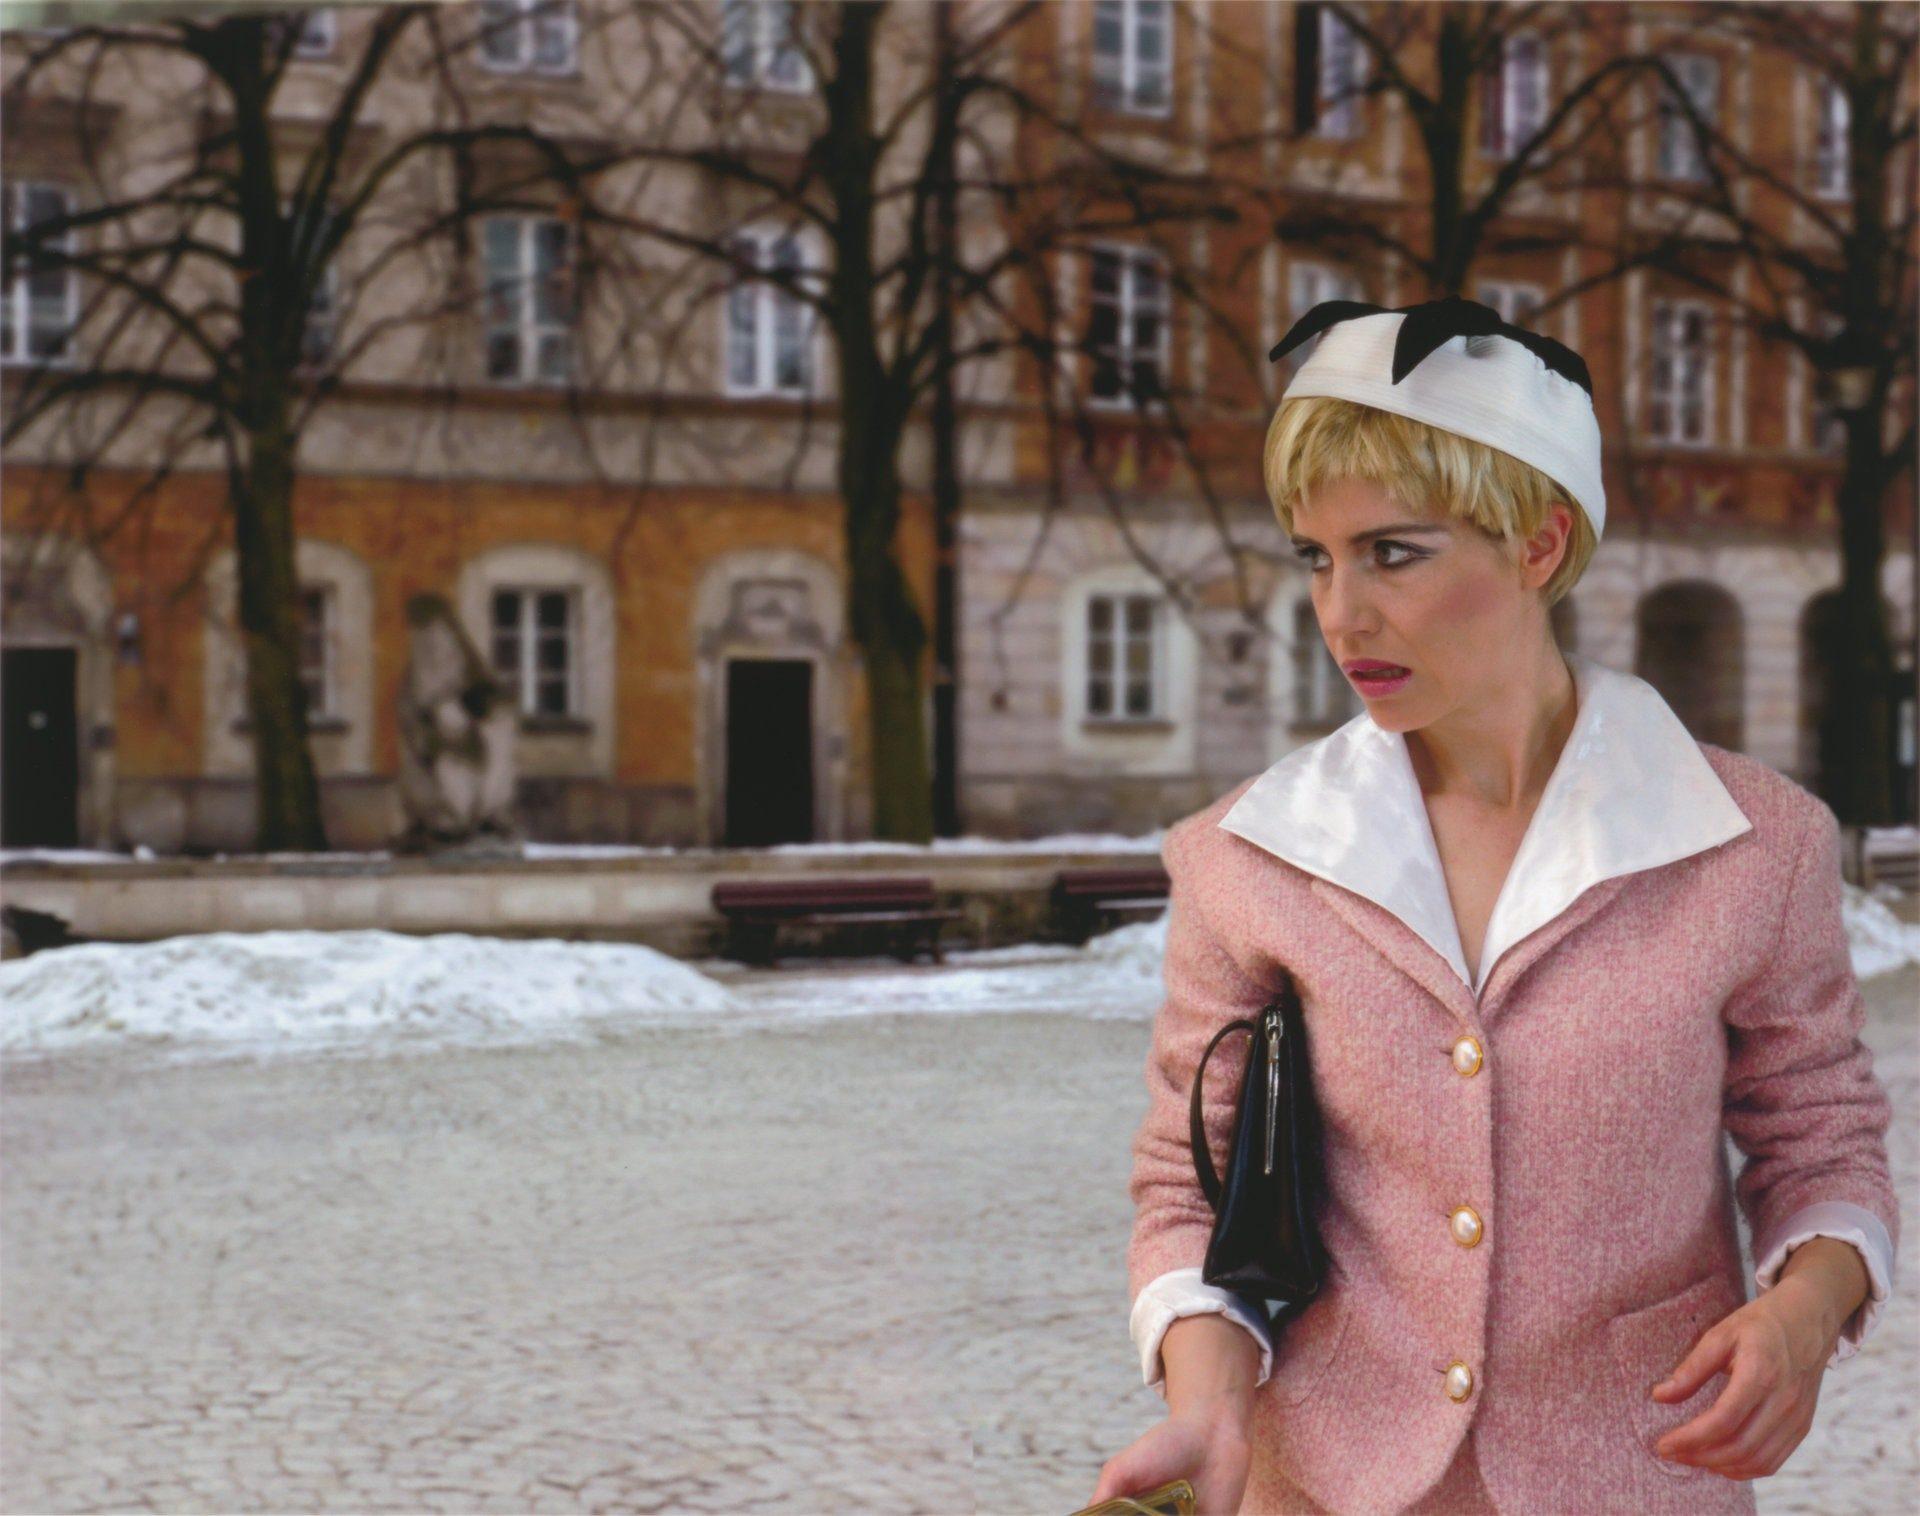 Aneta Grzeszykowska, Untitled Film Stills #4, 2006